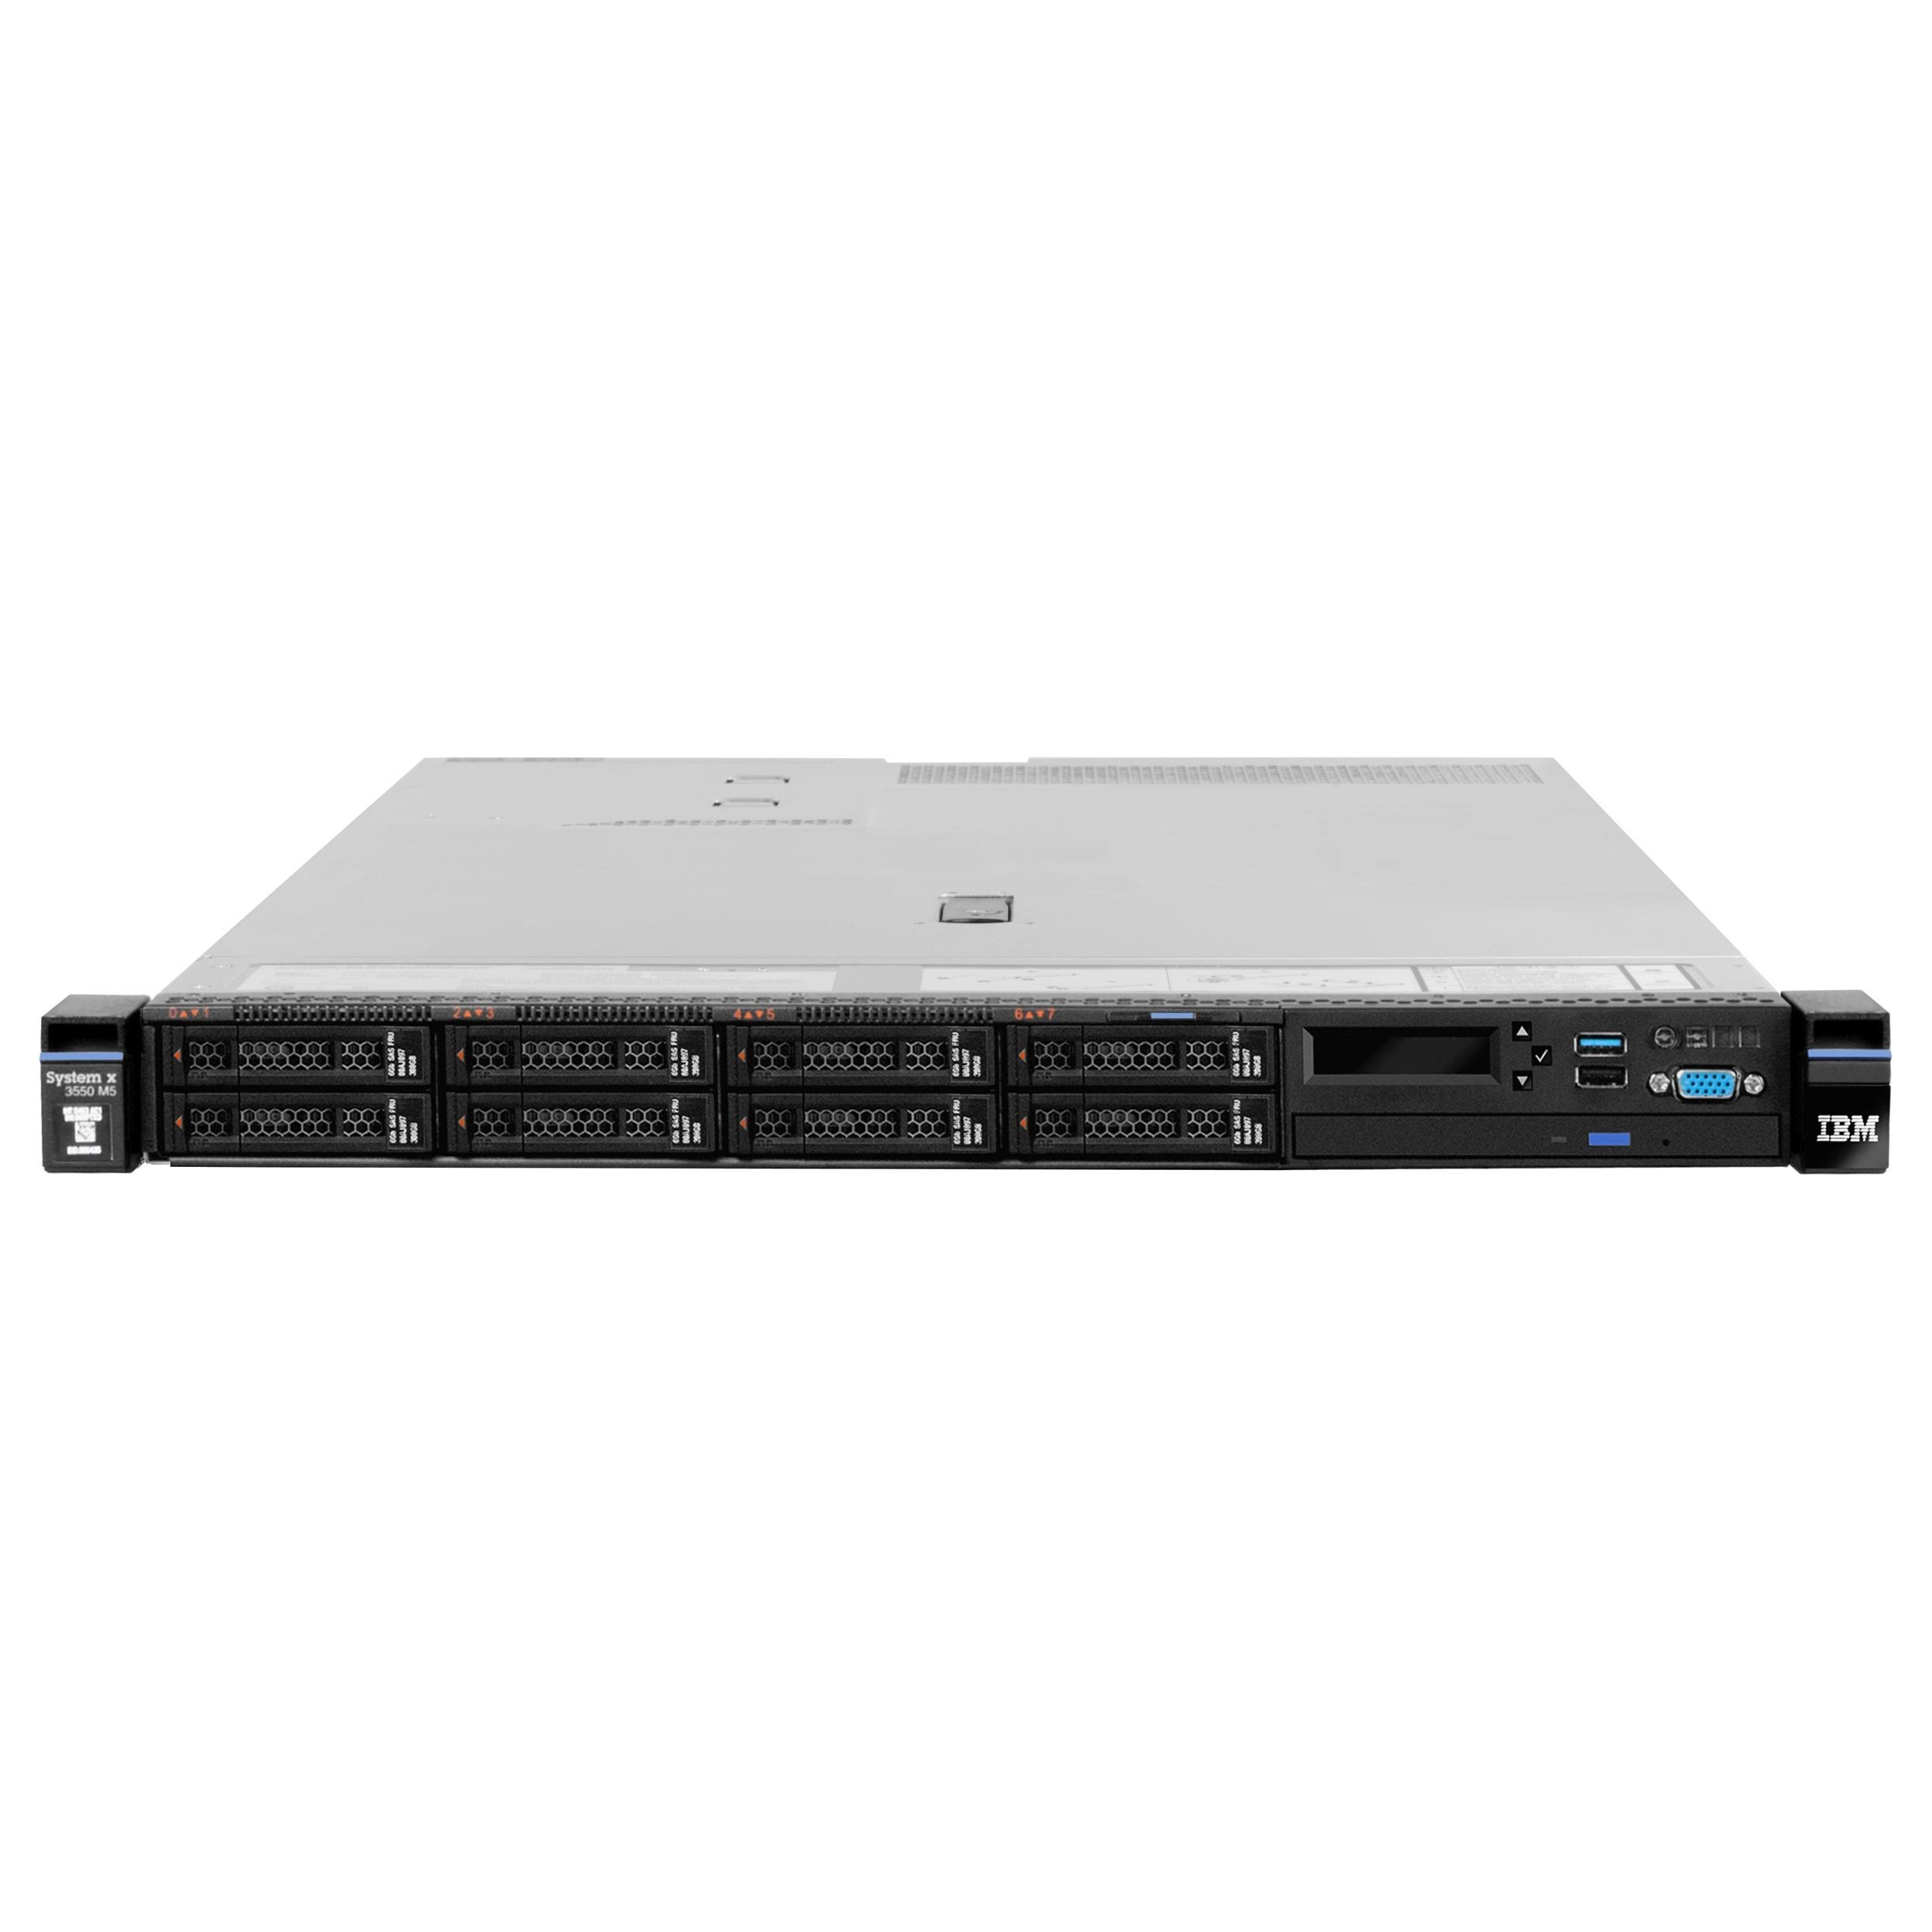 Lenovo System x x3550 M5 8869KDU 1U Rack Server - 1 x Intel Xeon E5-2